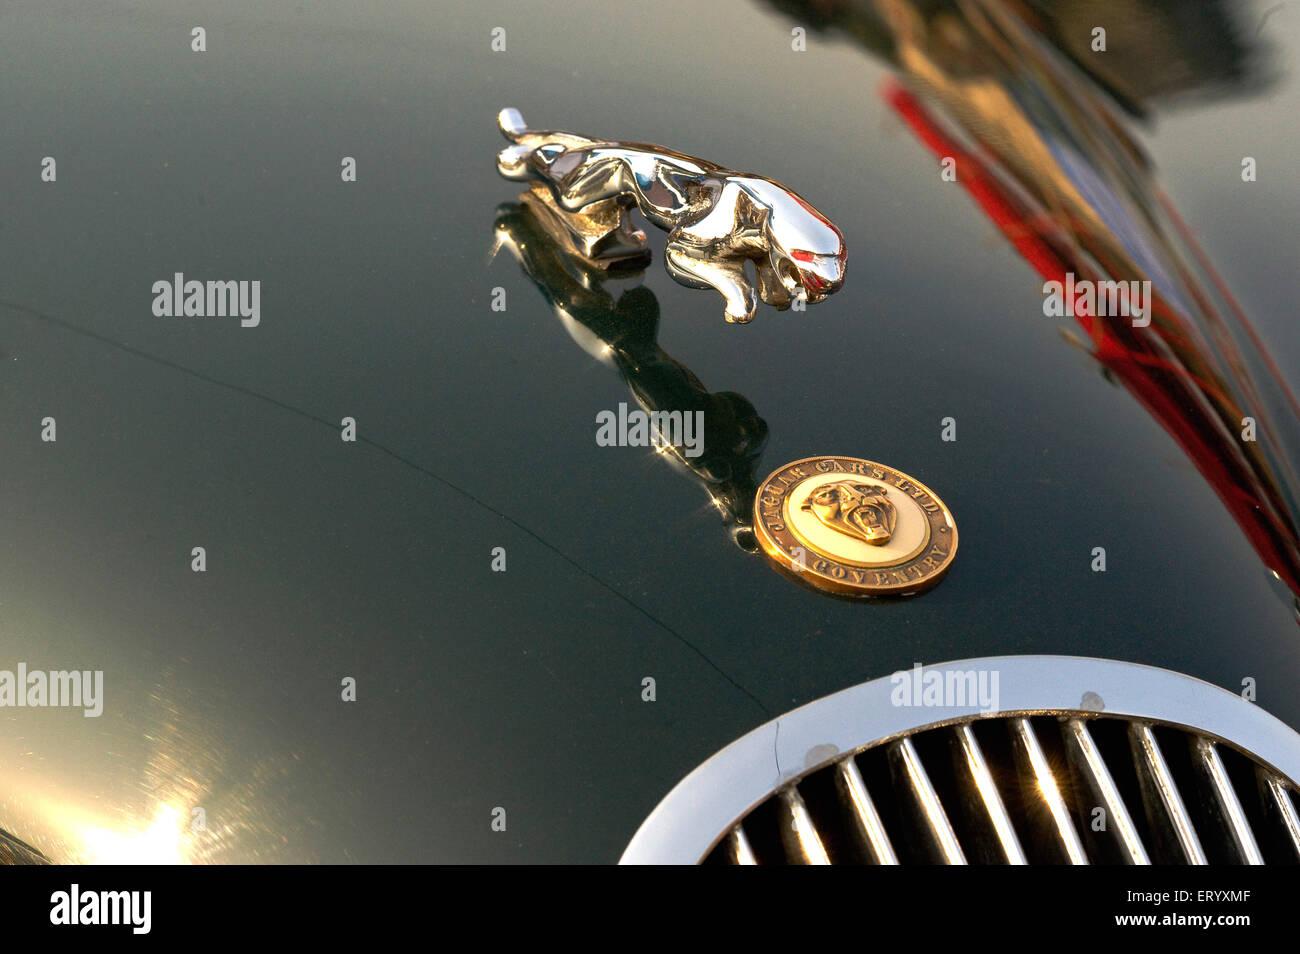 Jaguar car logo stock photo 136783265 alamy jaguar logo on bonnet of vintage car 1962 india stock photo buycottarizona